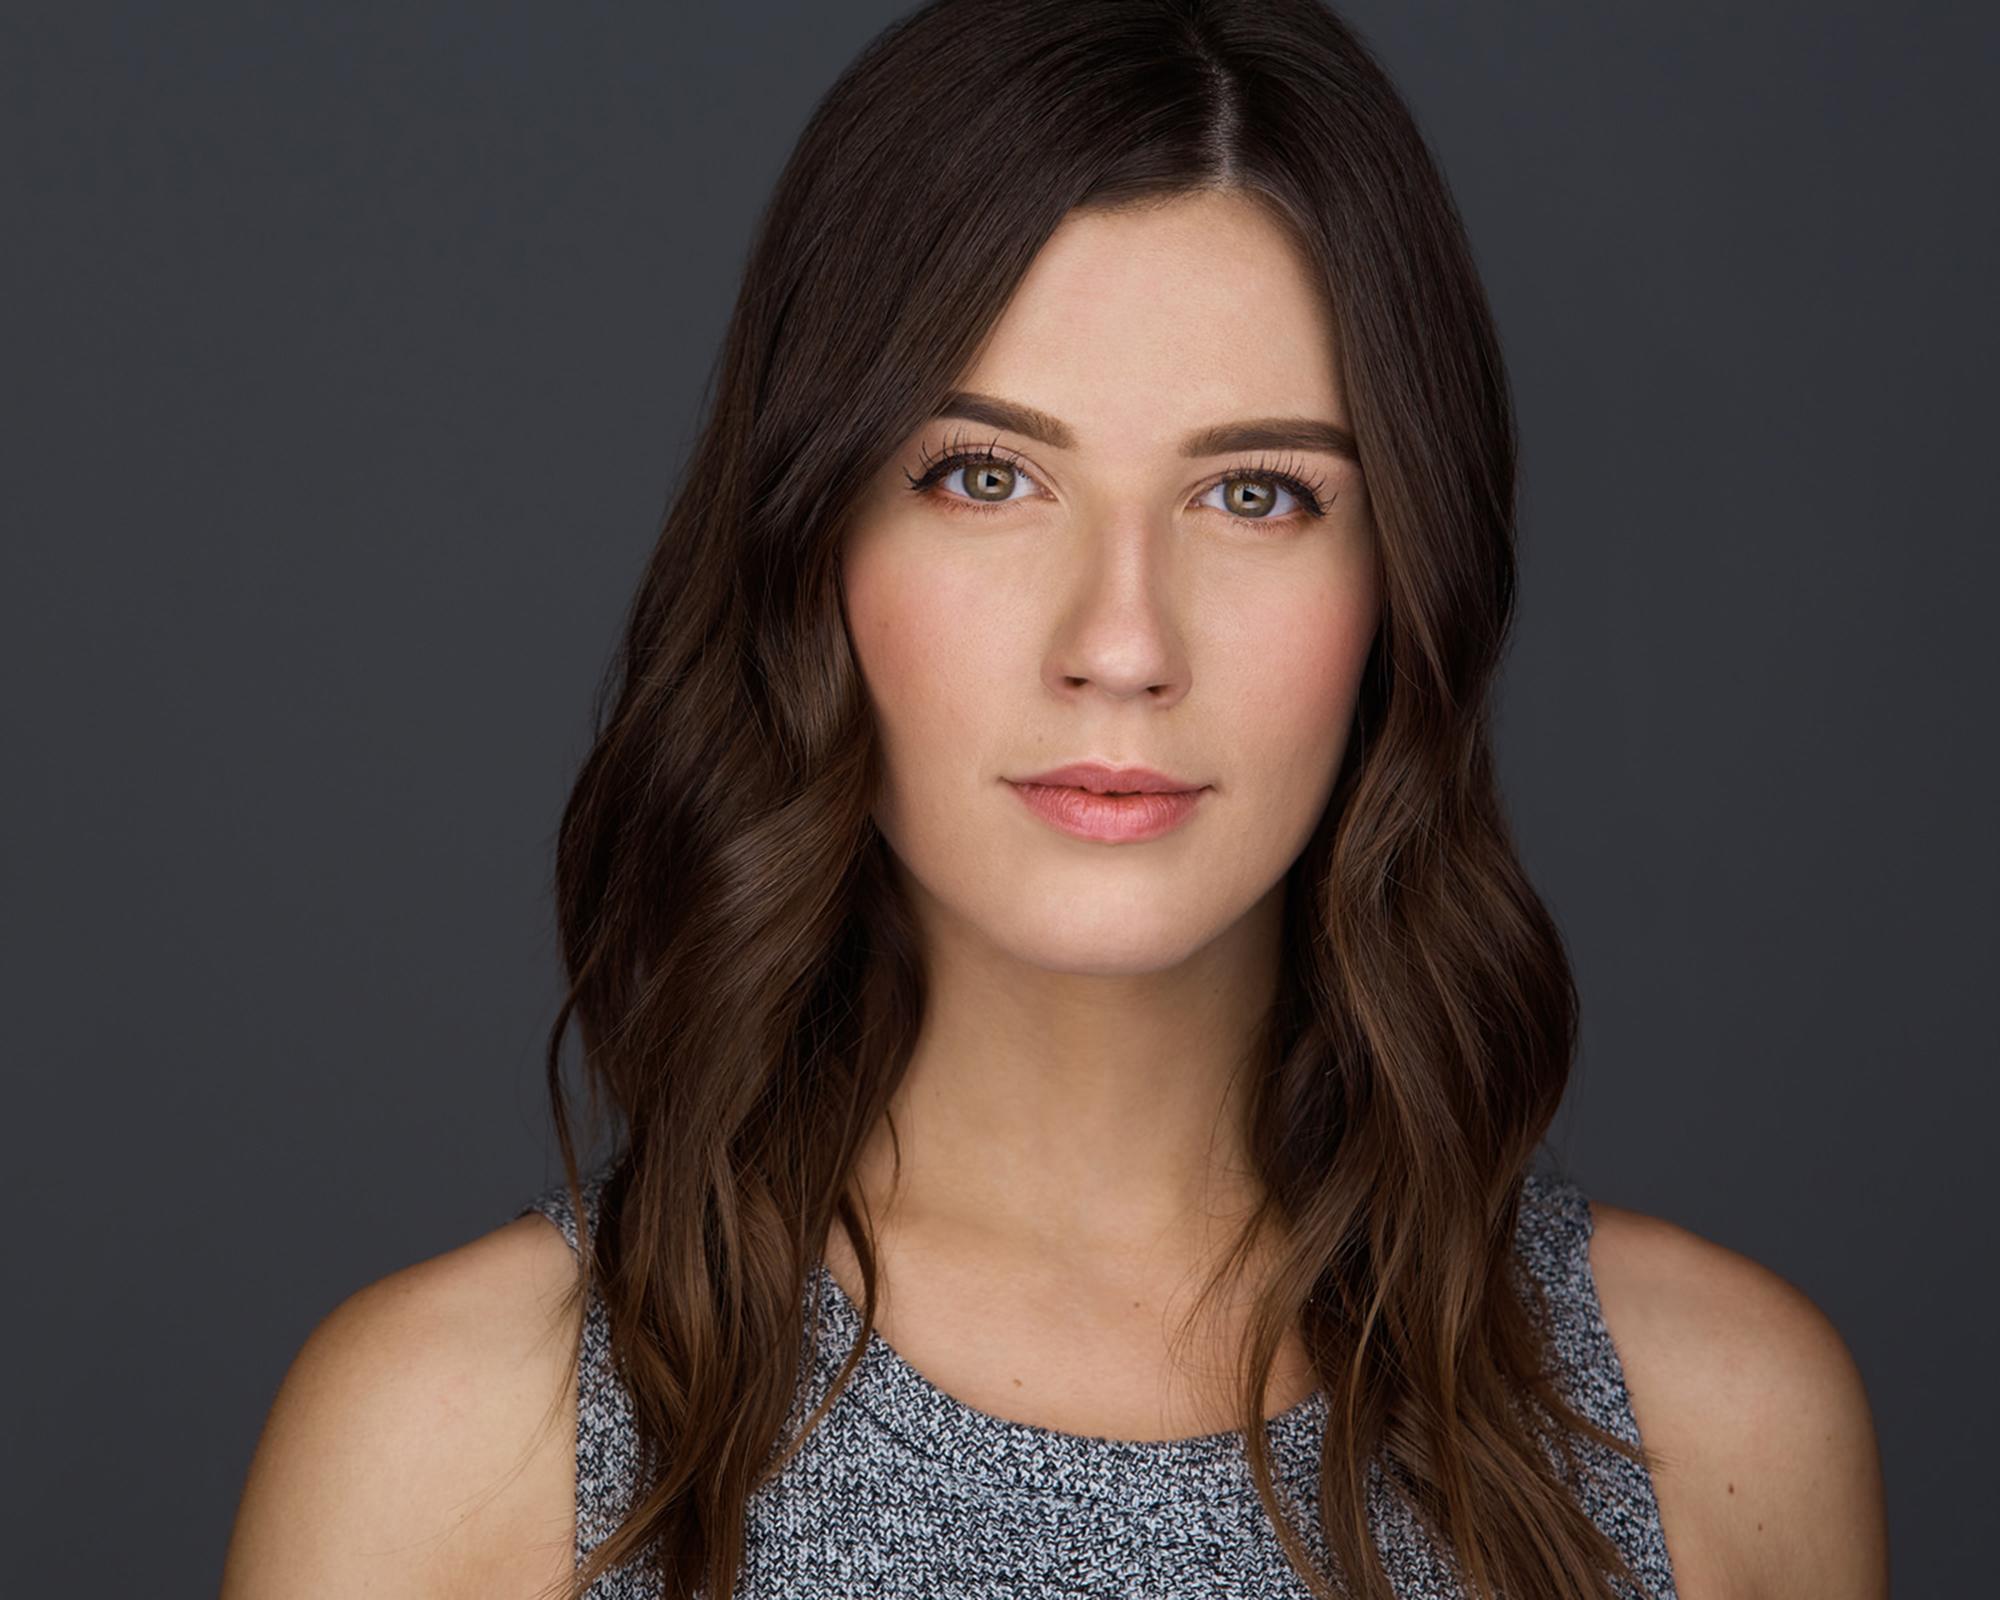 Jessica Andrews--Ryan-Parker-Photography-Edmonton-Headshots-Alberta-Headshot-Portrait-Photographer-Corporate-Actor-Business-Professional-Acting-Studio-Calgary.jpg